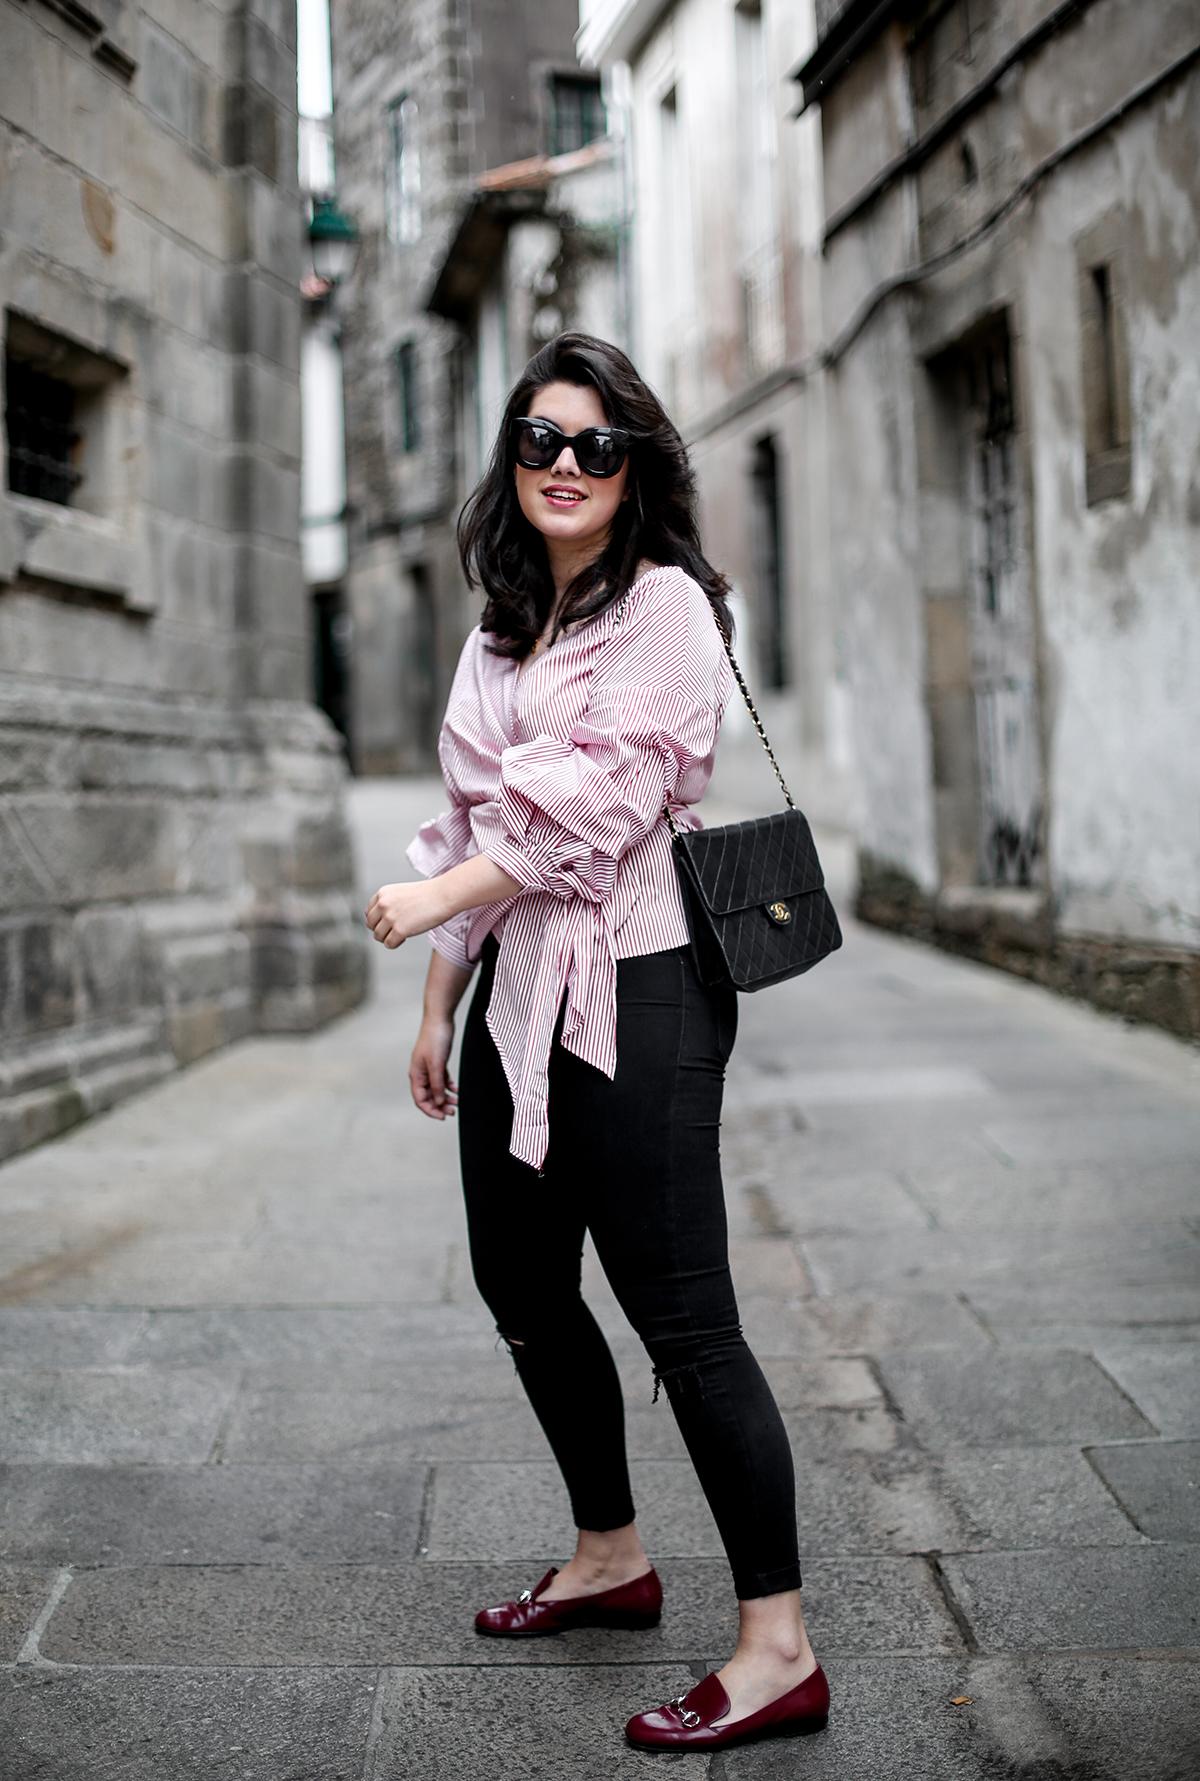 blusa-cruzada-zara-chanel-vintage-vestiaire-collective-myblueberrynightsblog8